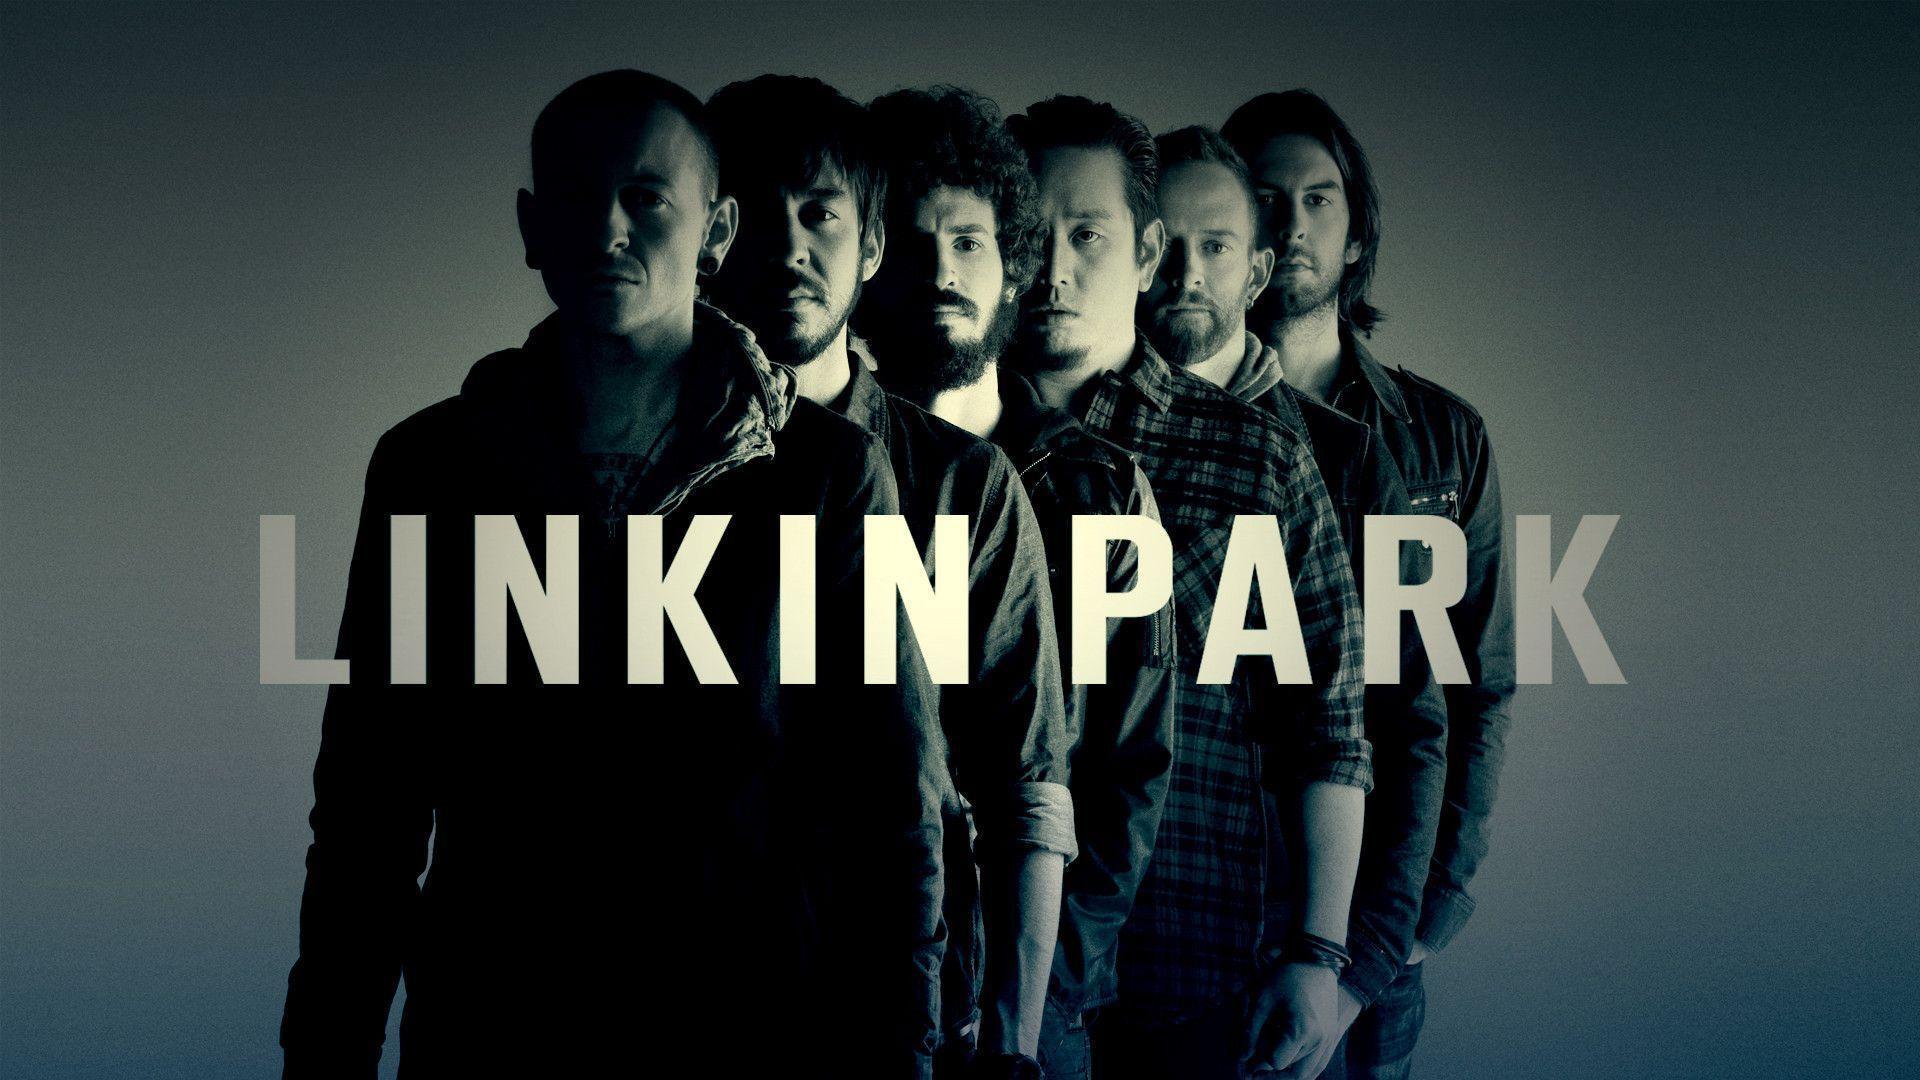 Linkin Park Wallpapers HD  Wallpaper